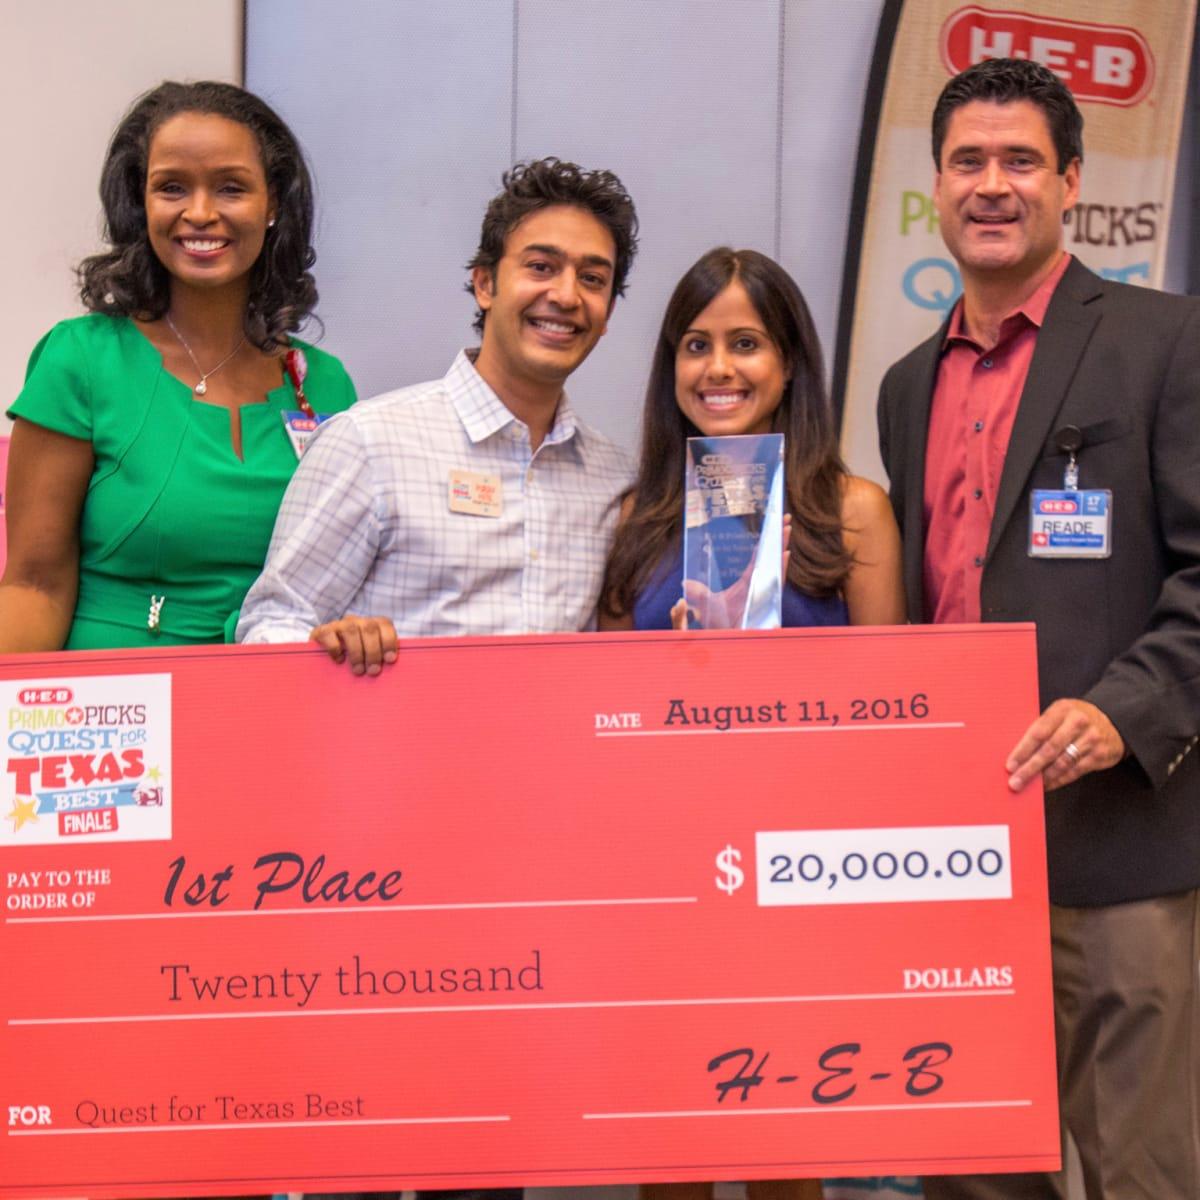 H-E-B Texas Best Bagel Dots - Winell Herron, Purav Patel & Aarti Garehgrat, Reade Ahrens